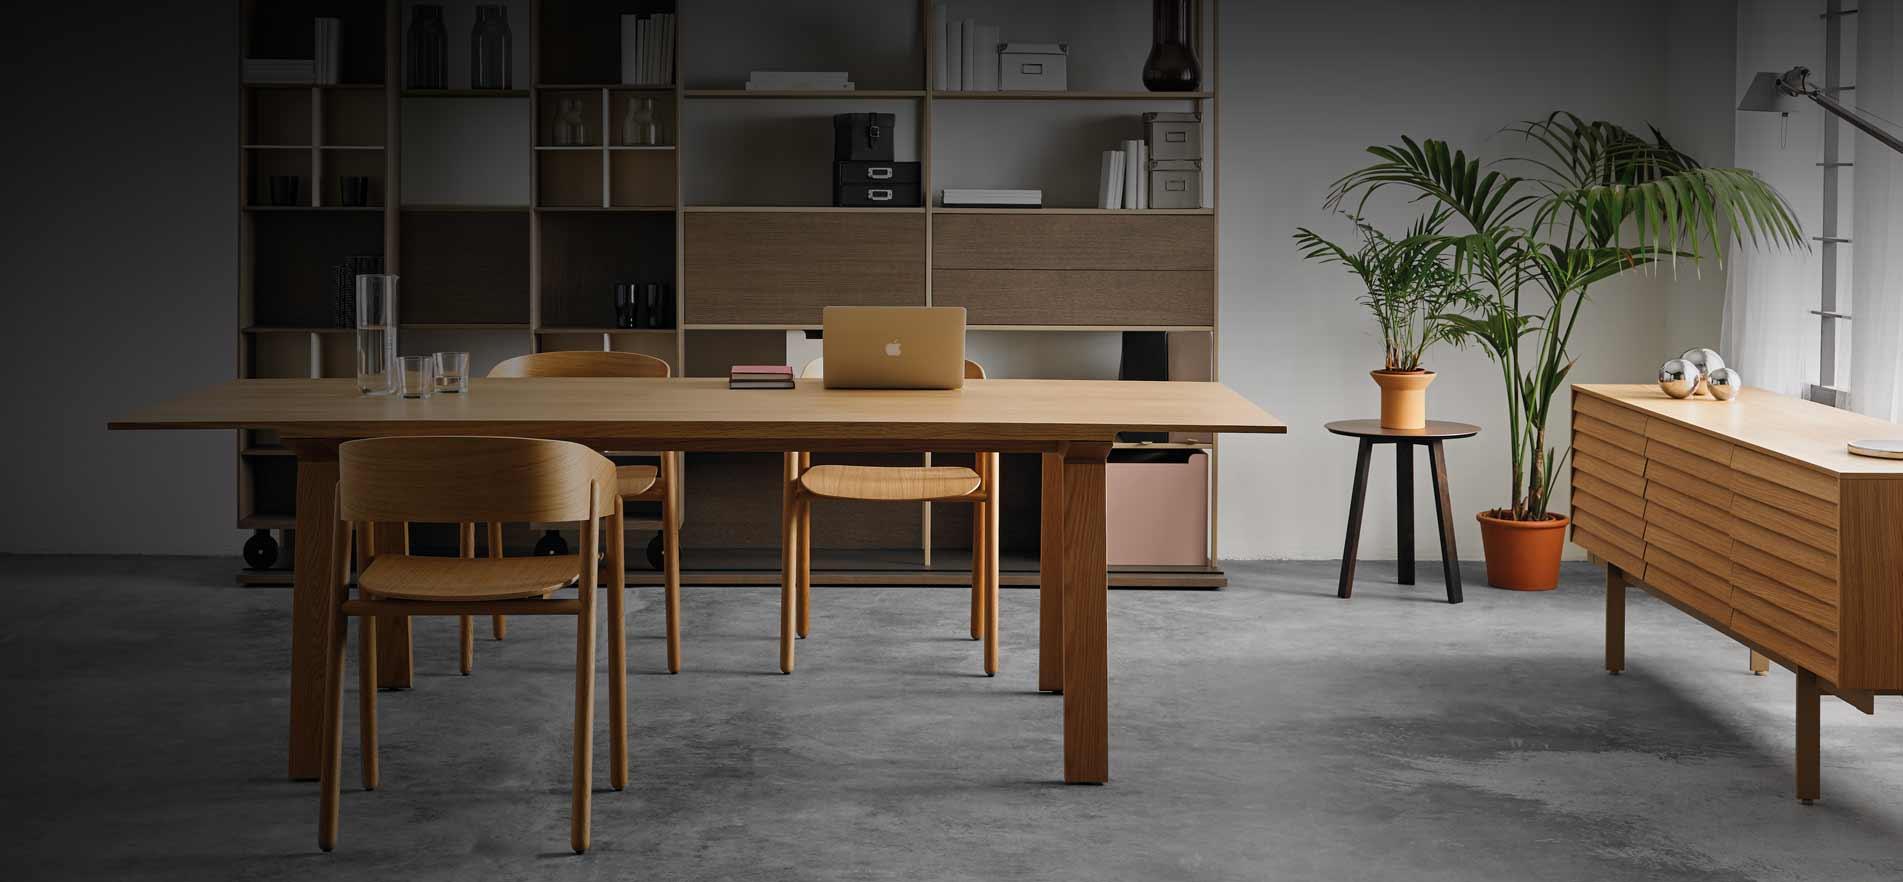 punt design m bel aus spanien online kaufen. Black Bedroom Furniture Sets. Home Design Ideas